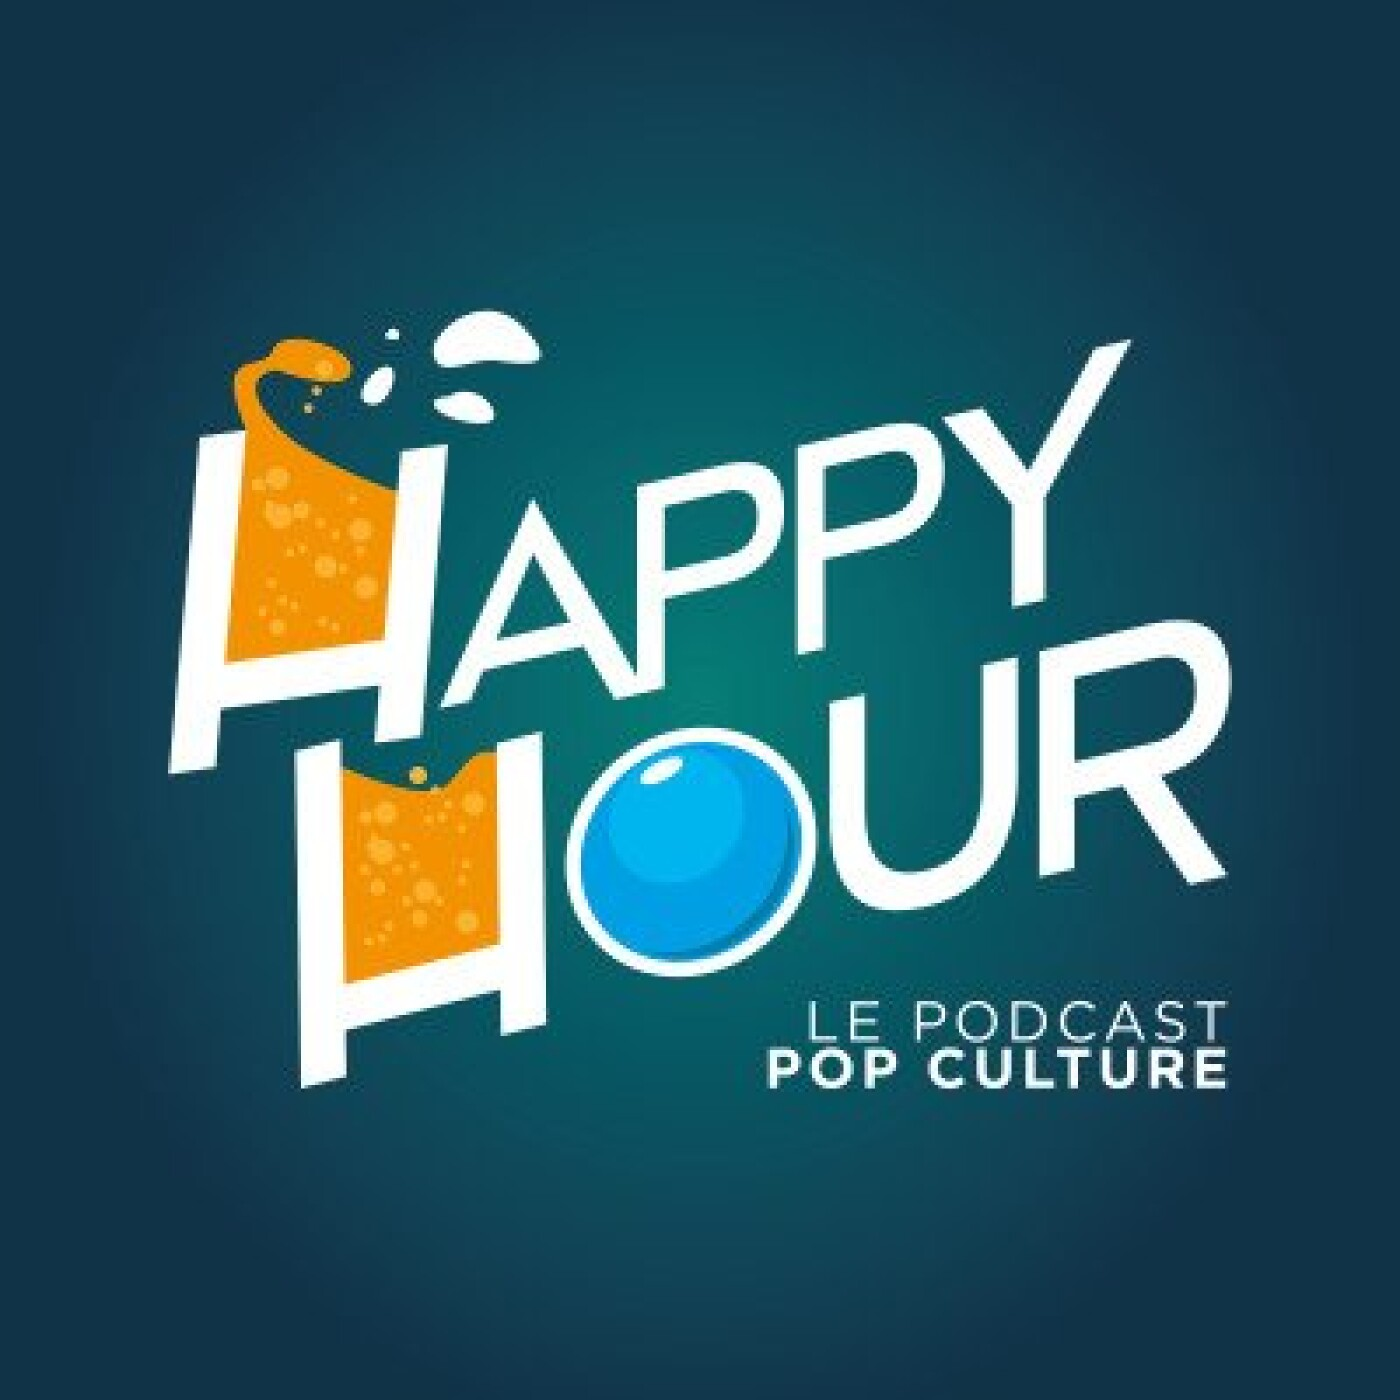 Happy Hour #44 : les César, Nextwave, The Outsider, Skam France, Baron Noir, Star Trek Picard